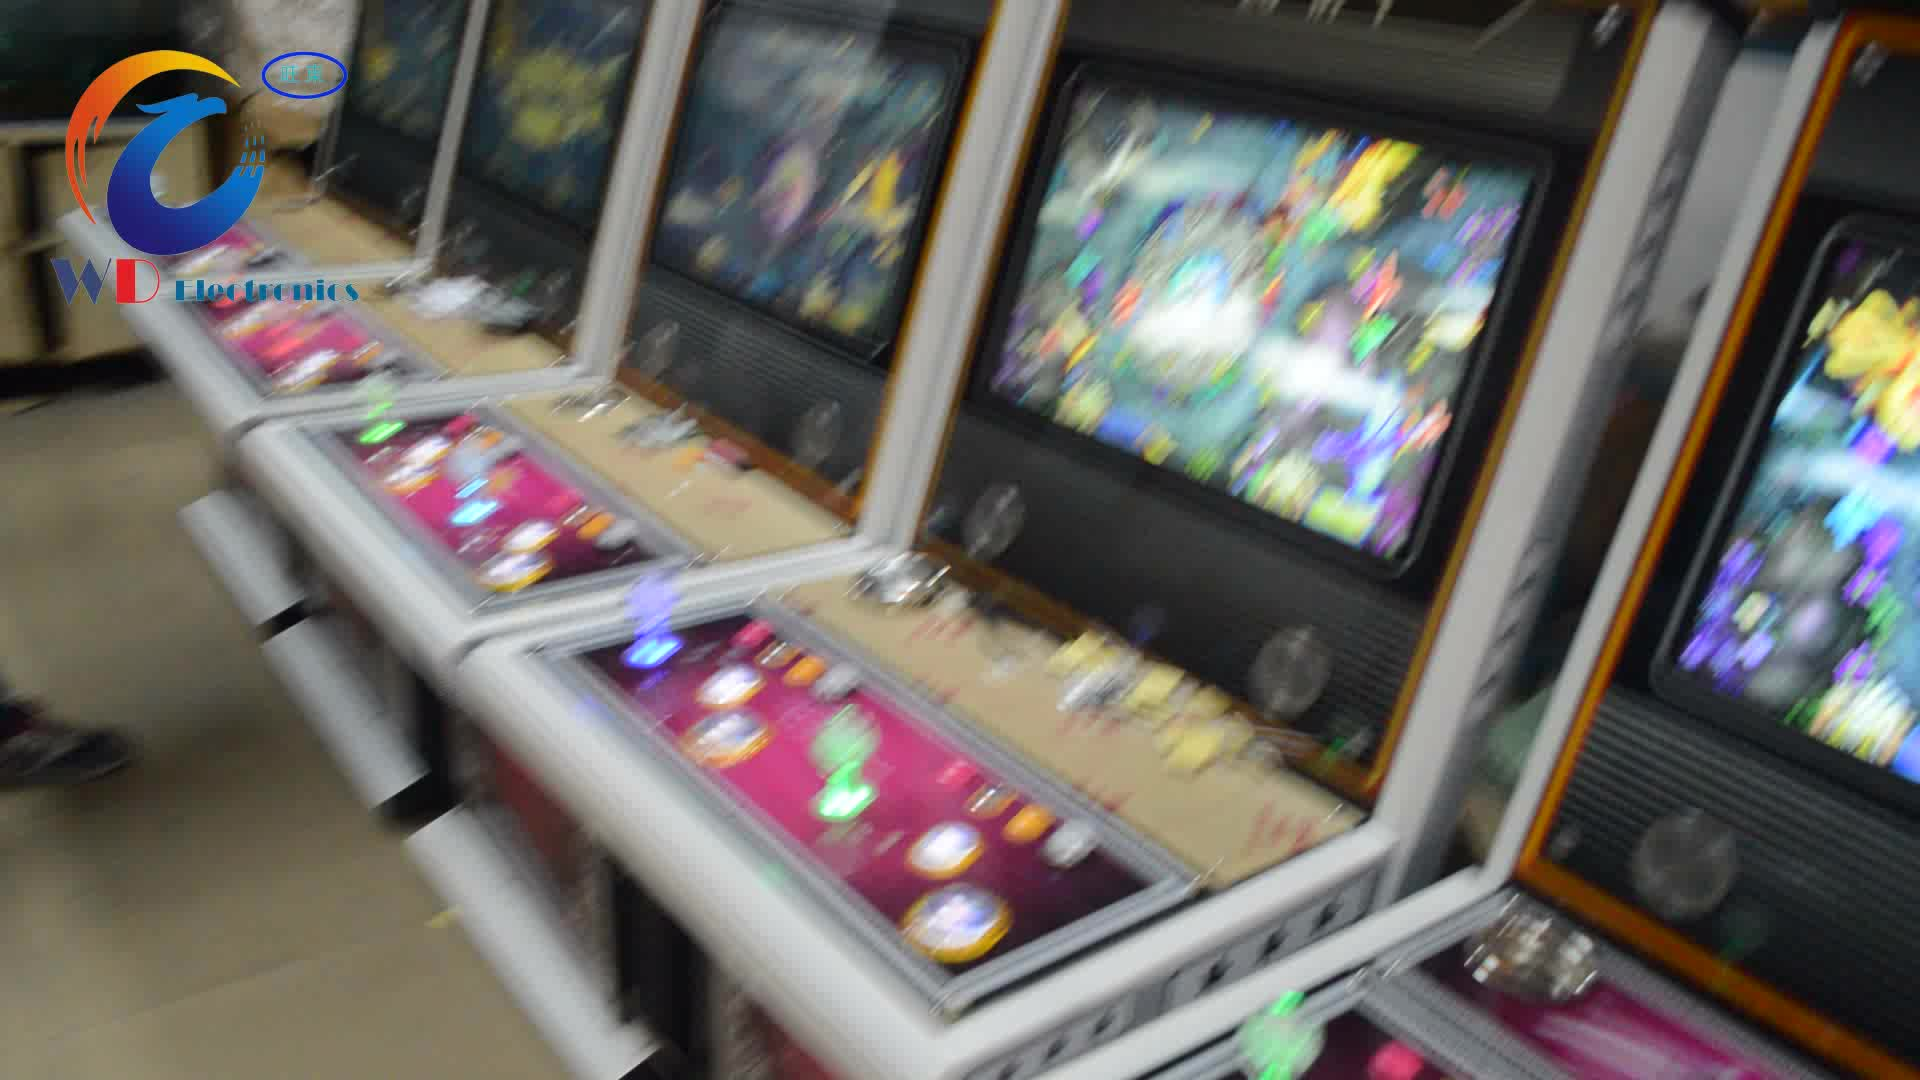 Fish hunter ocean king 2 arcade cheats game buy fish for Fish table game tips